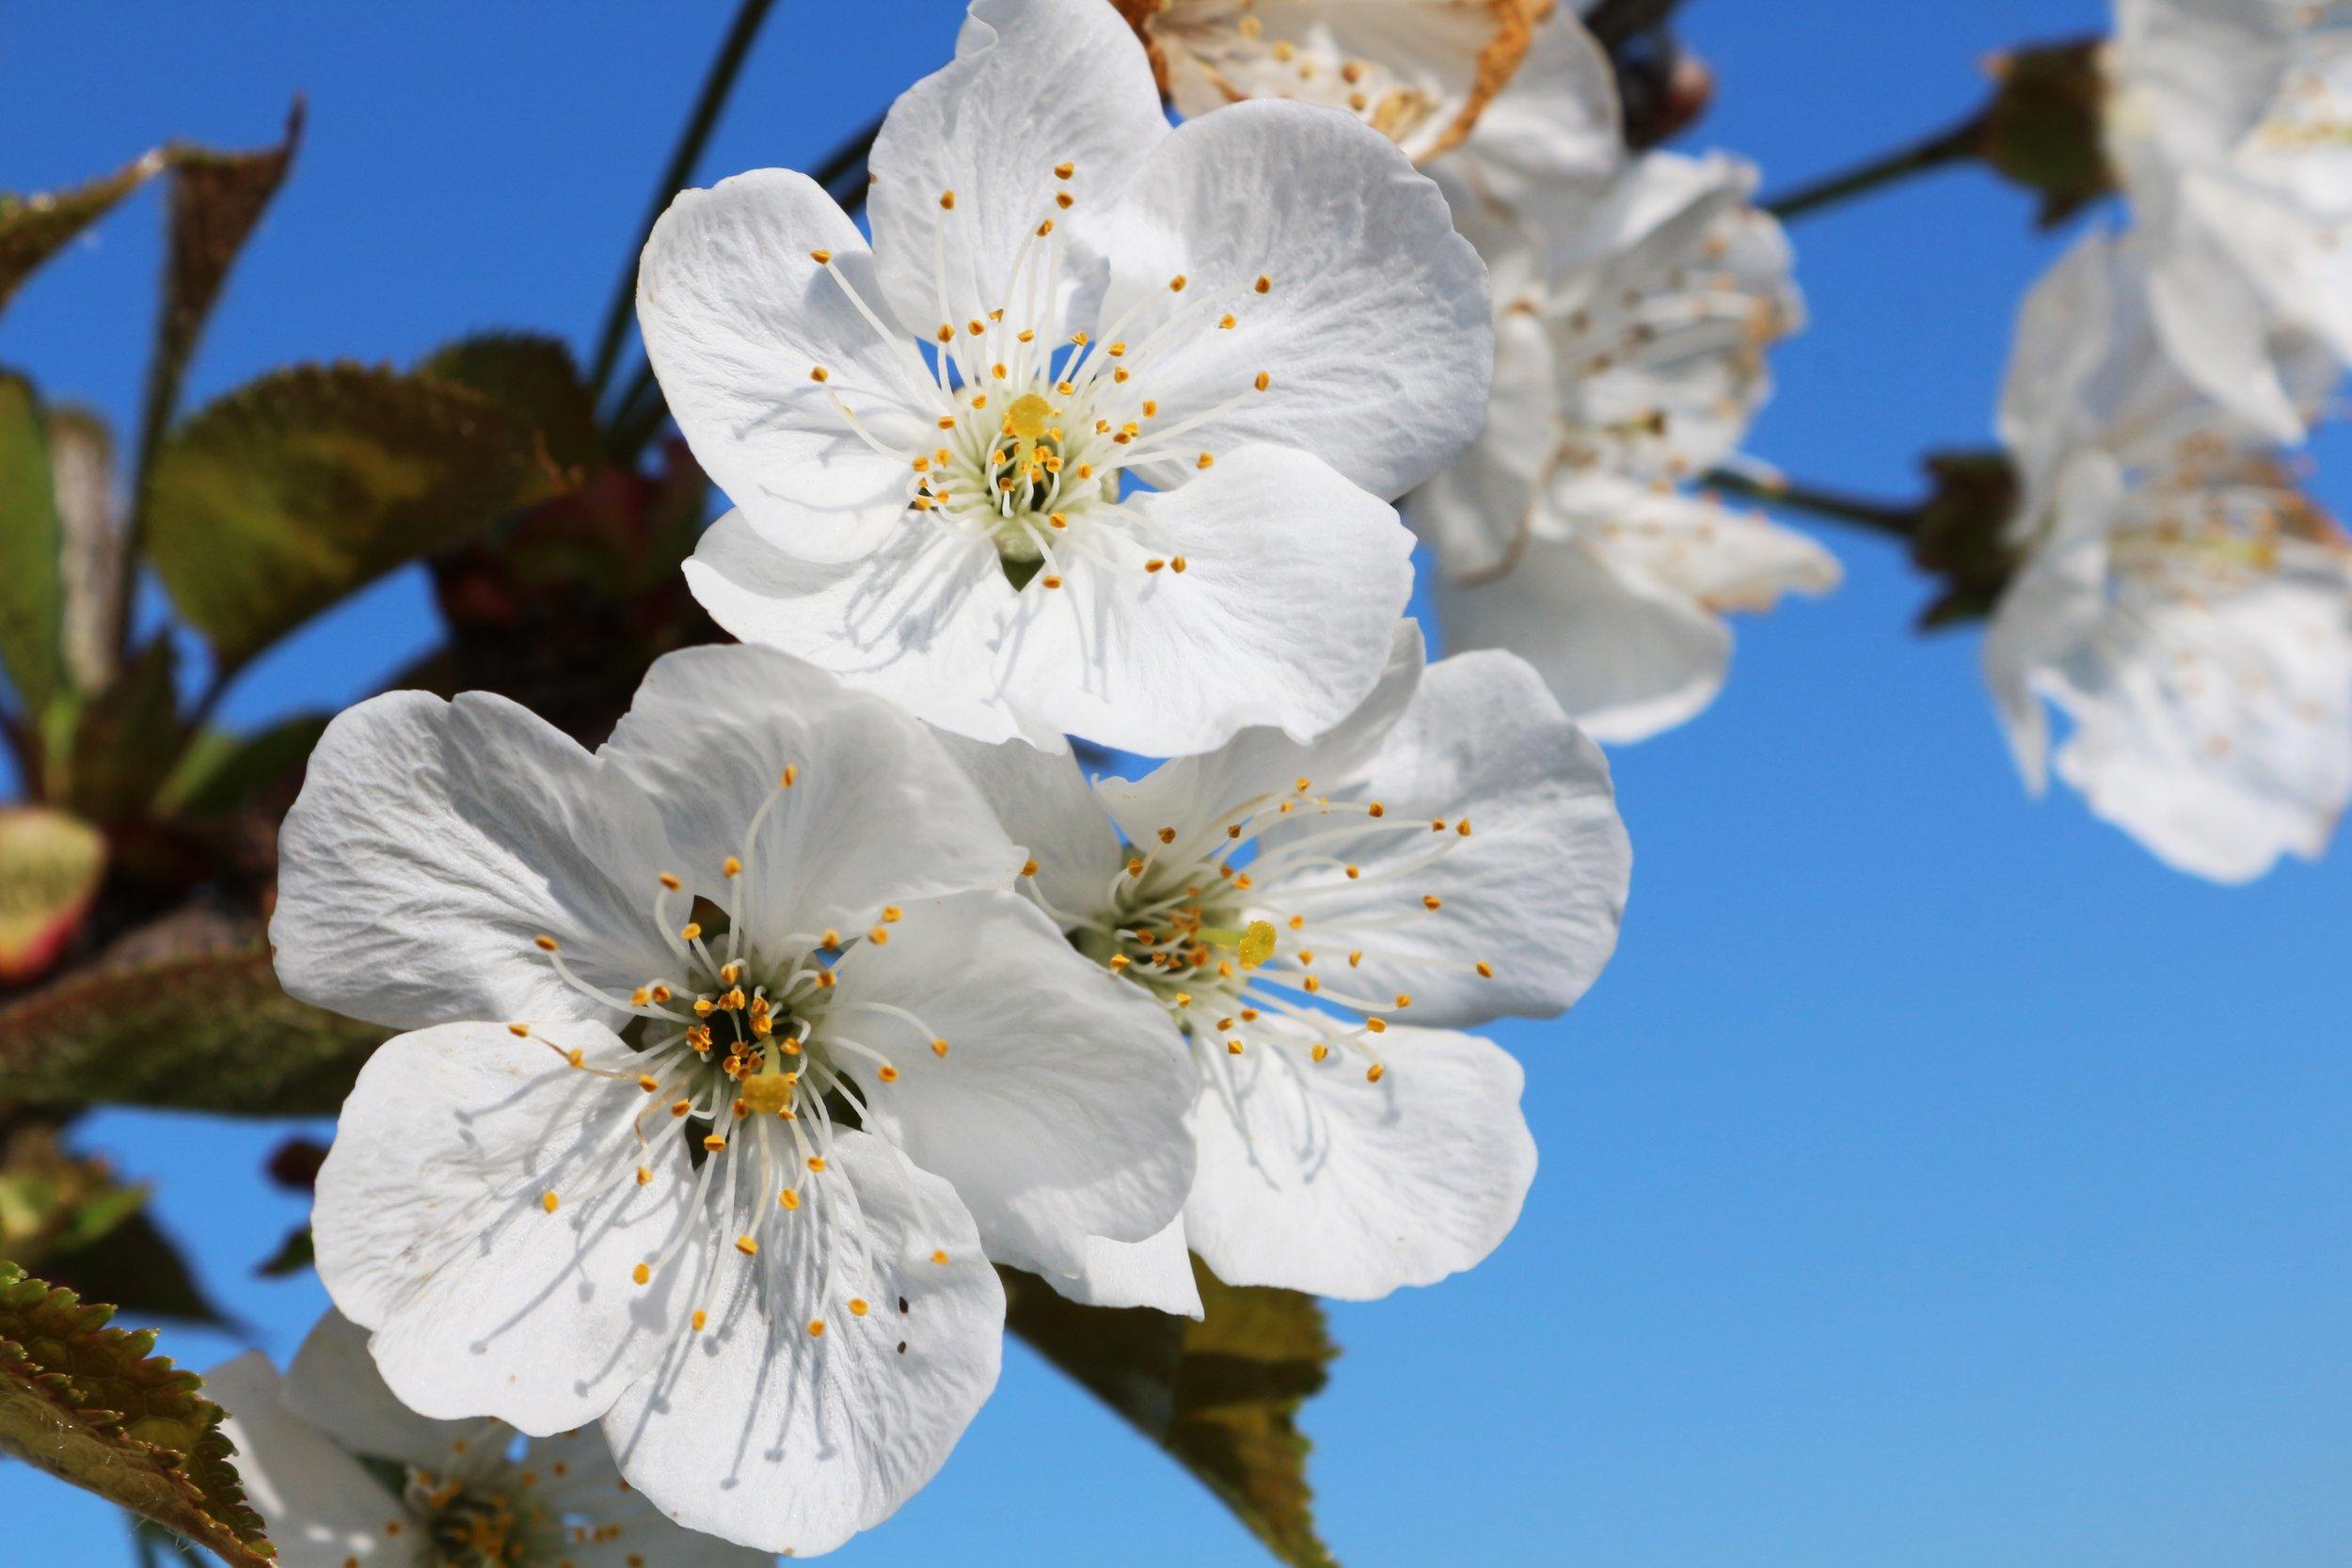 _absolutely_free_photos_original_photos_white-cherry-blossoms-5184x3456_87205.jpg